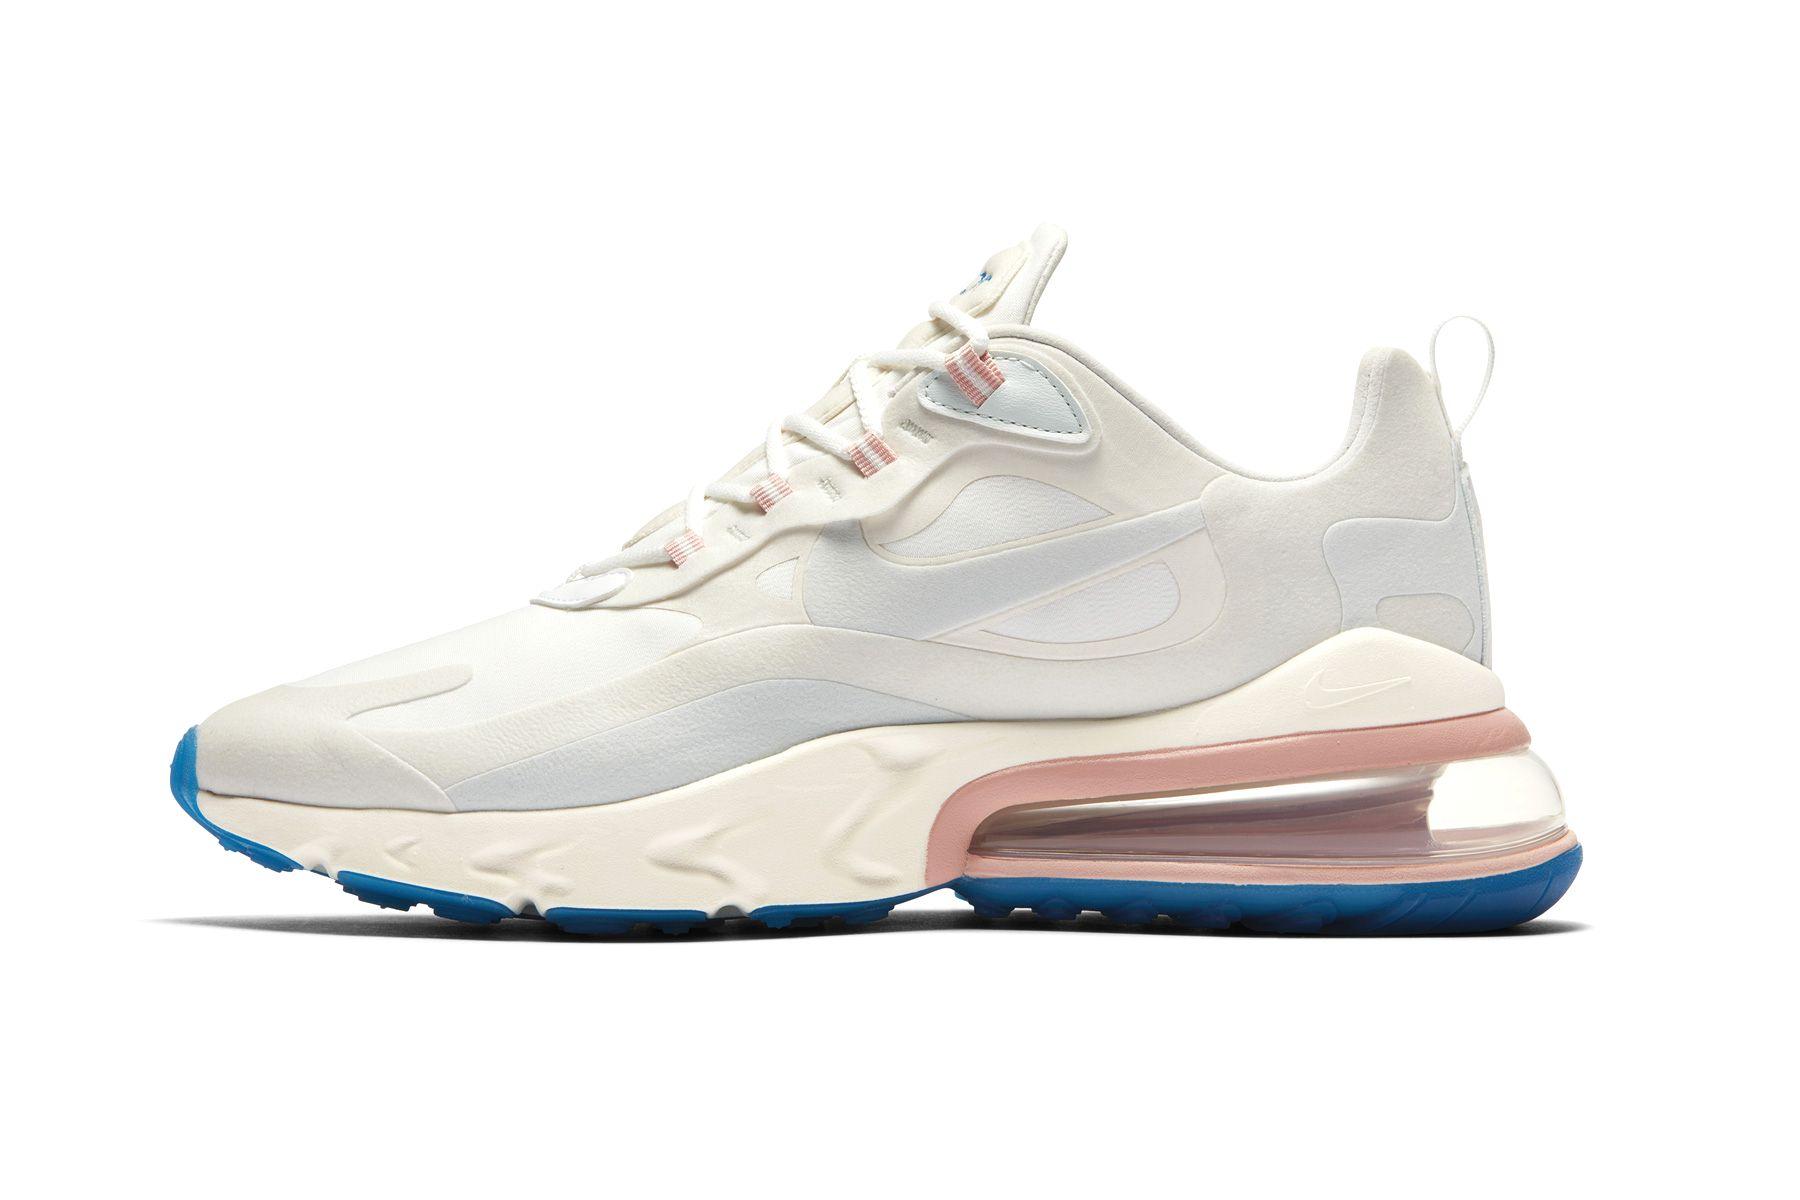 Nike Air Max 270 React - подробности релиза кроссовок